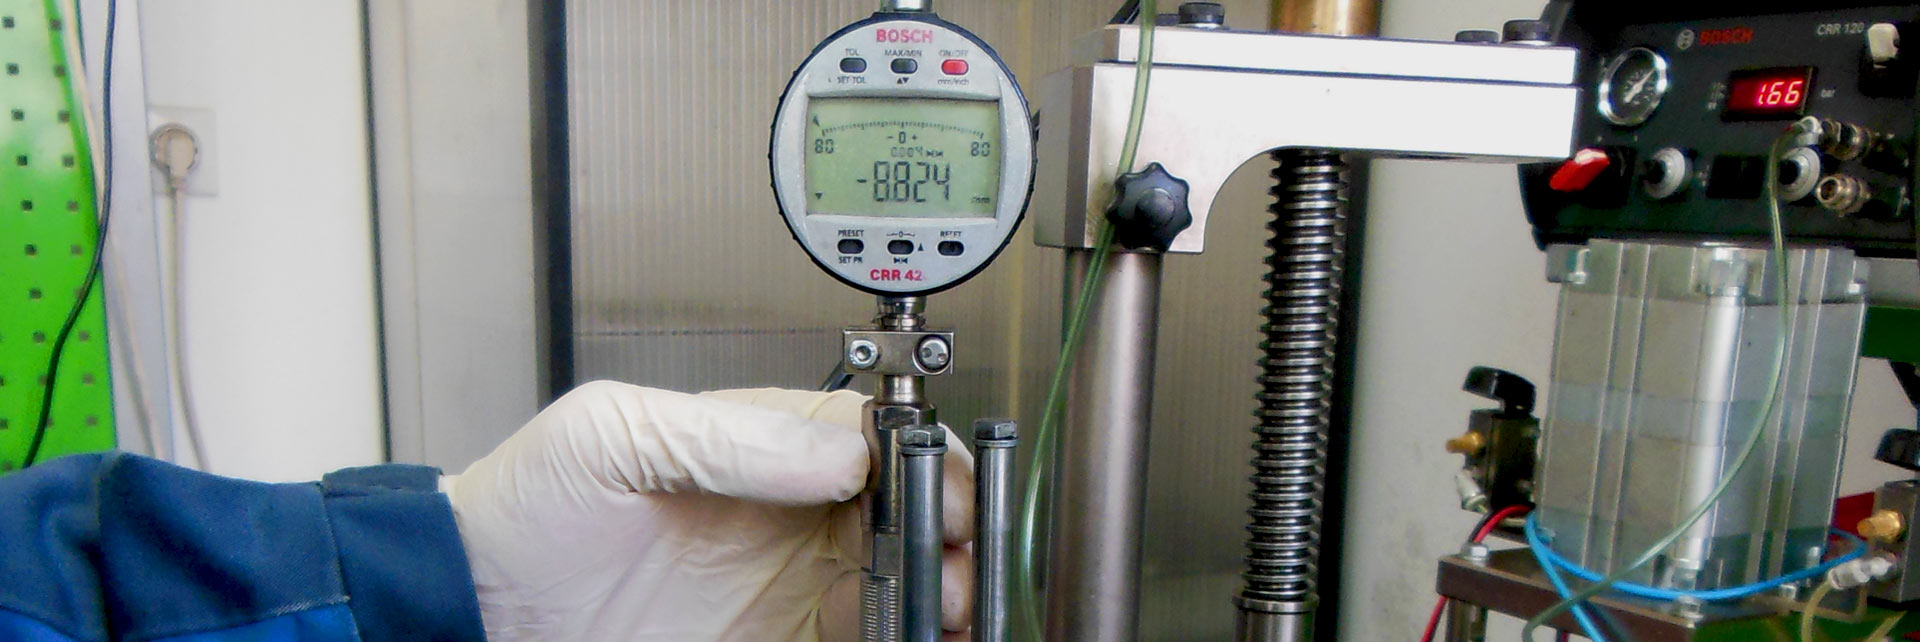 Dijagnostika i remont pumpe i dizne